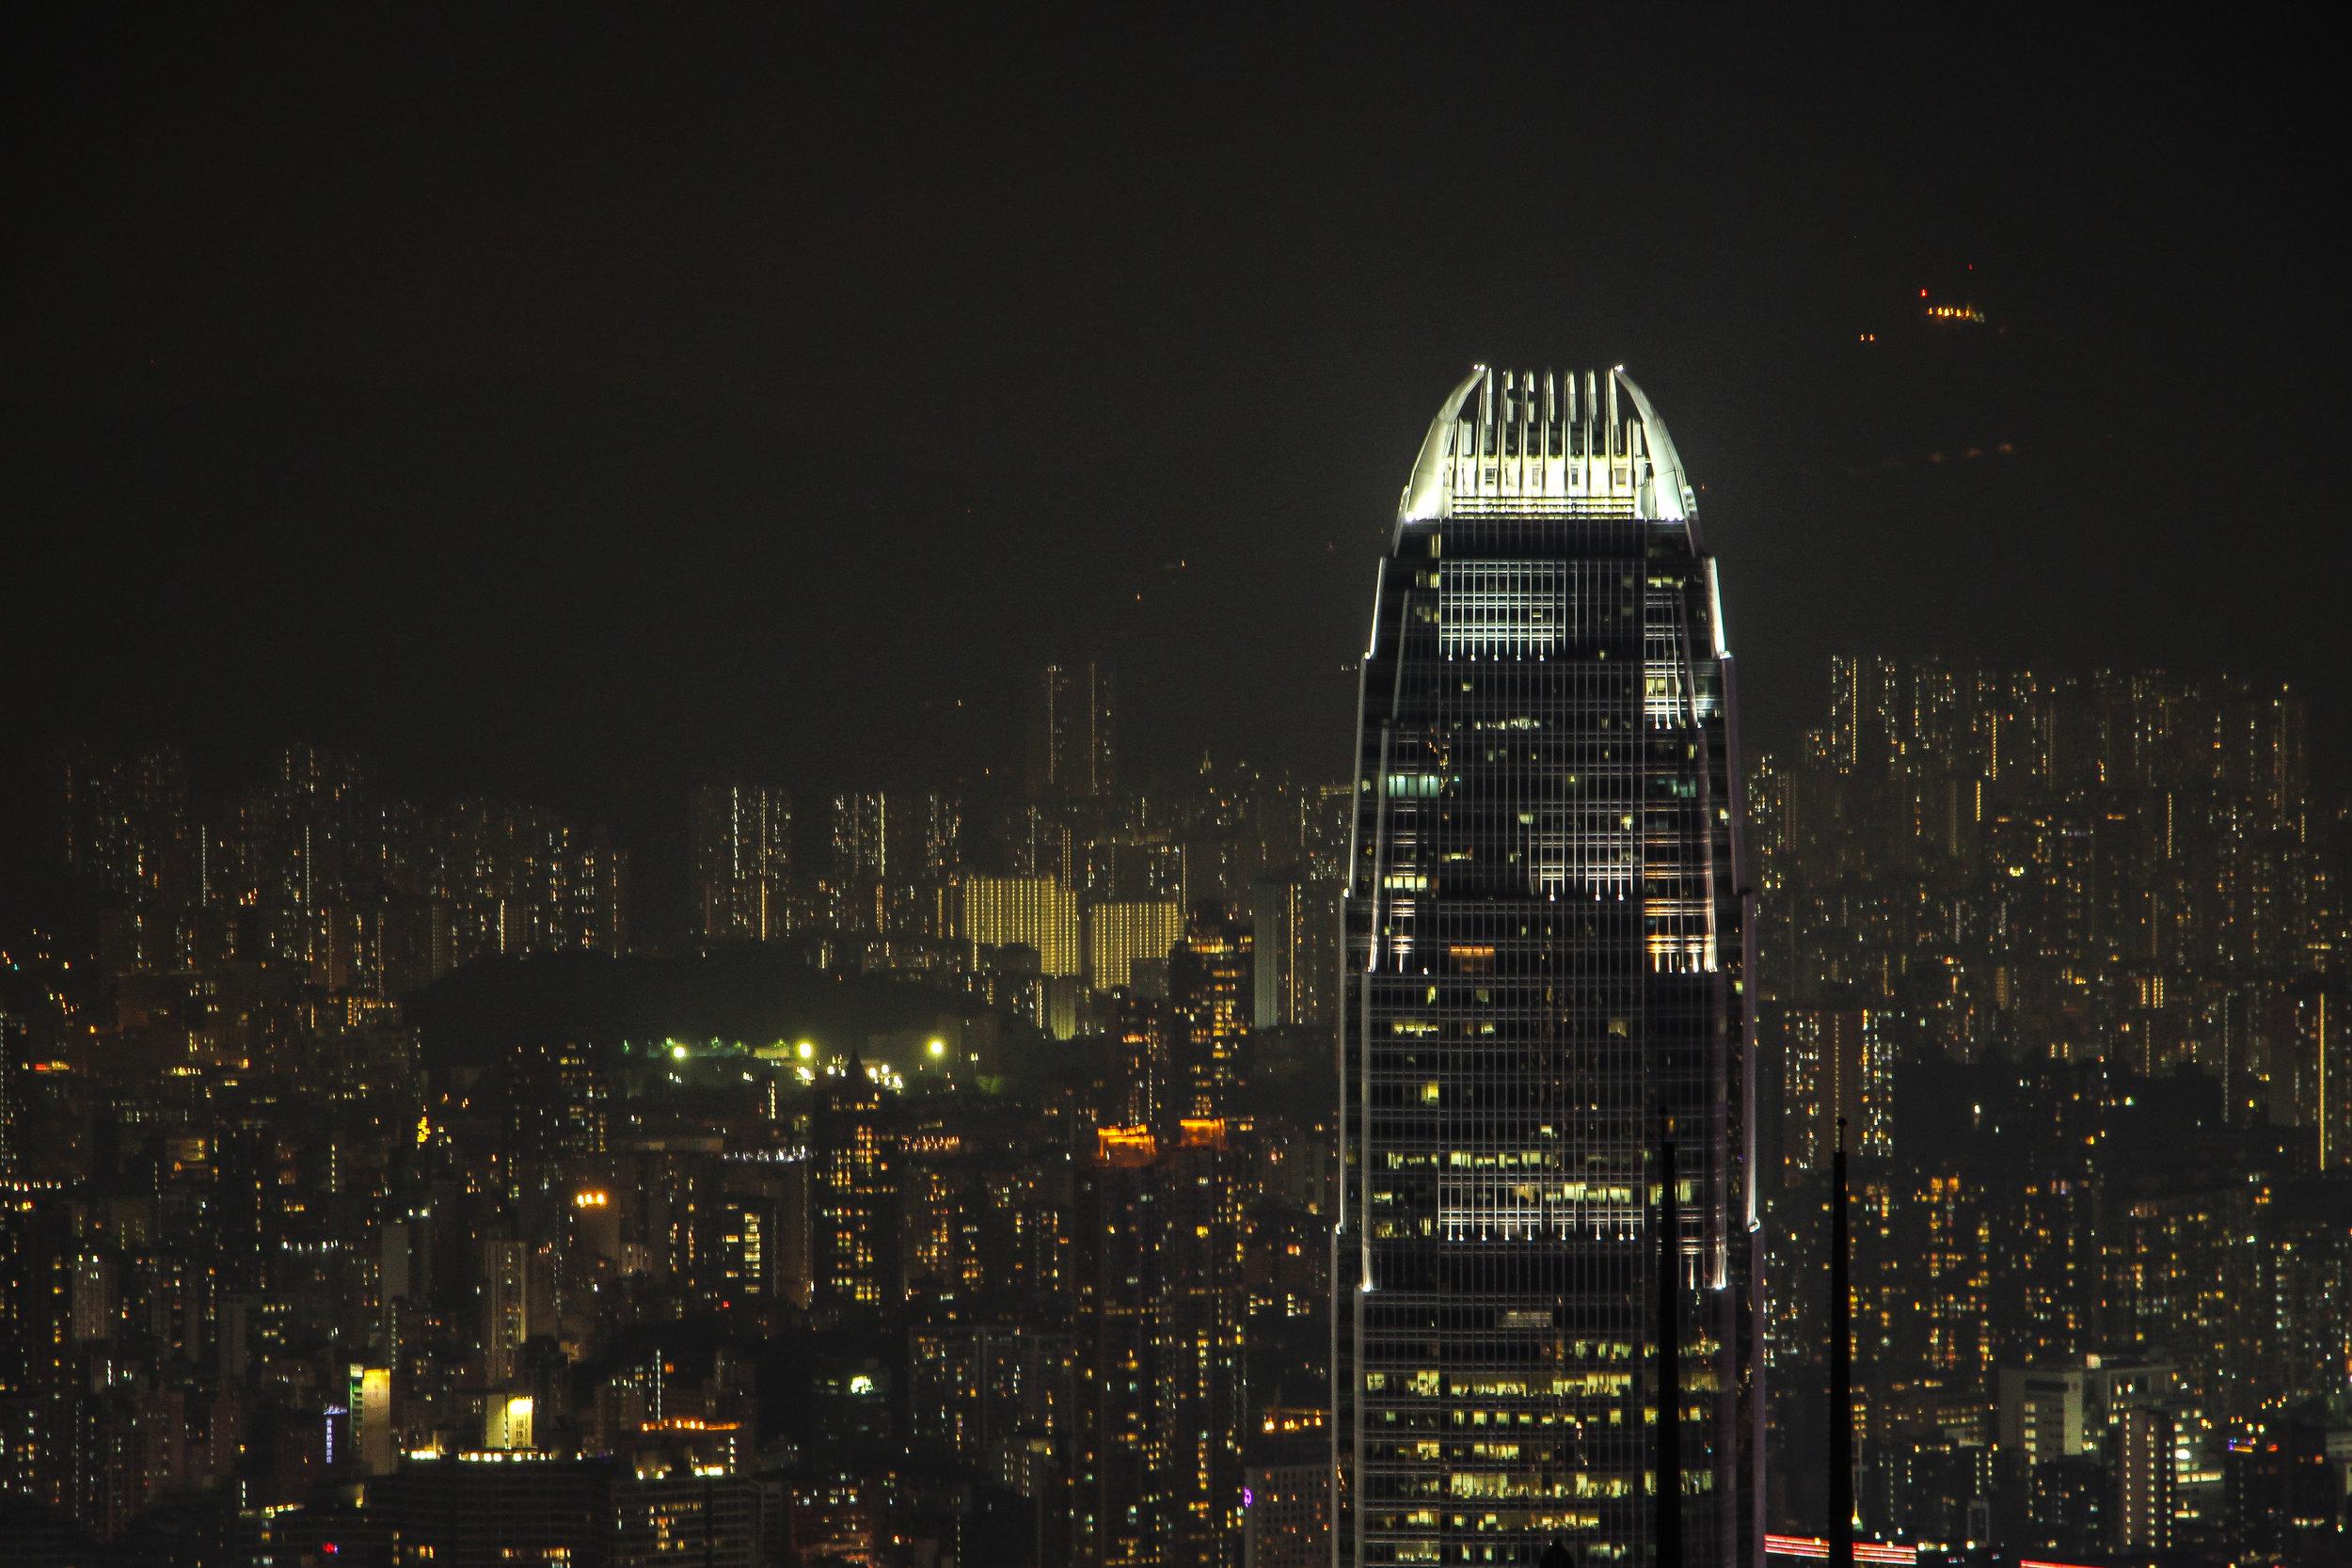 HONG KONG, HONG KONG ISLAND, KOWLOON, SOUTH CHINA SEA, VICTORIA PEAK, NIGHTLIGHT, ASIA | DOLESSGETMOREDONE.COM |